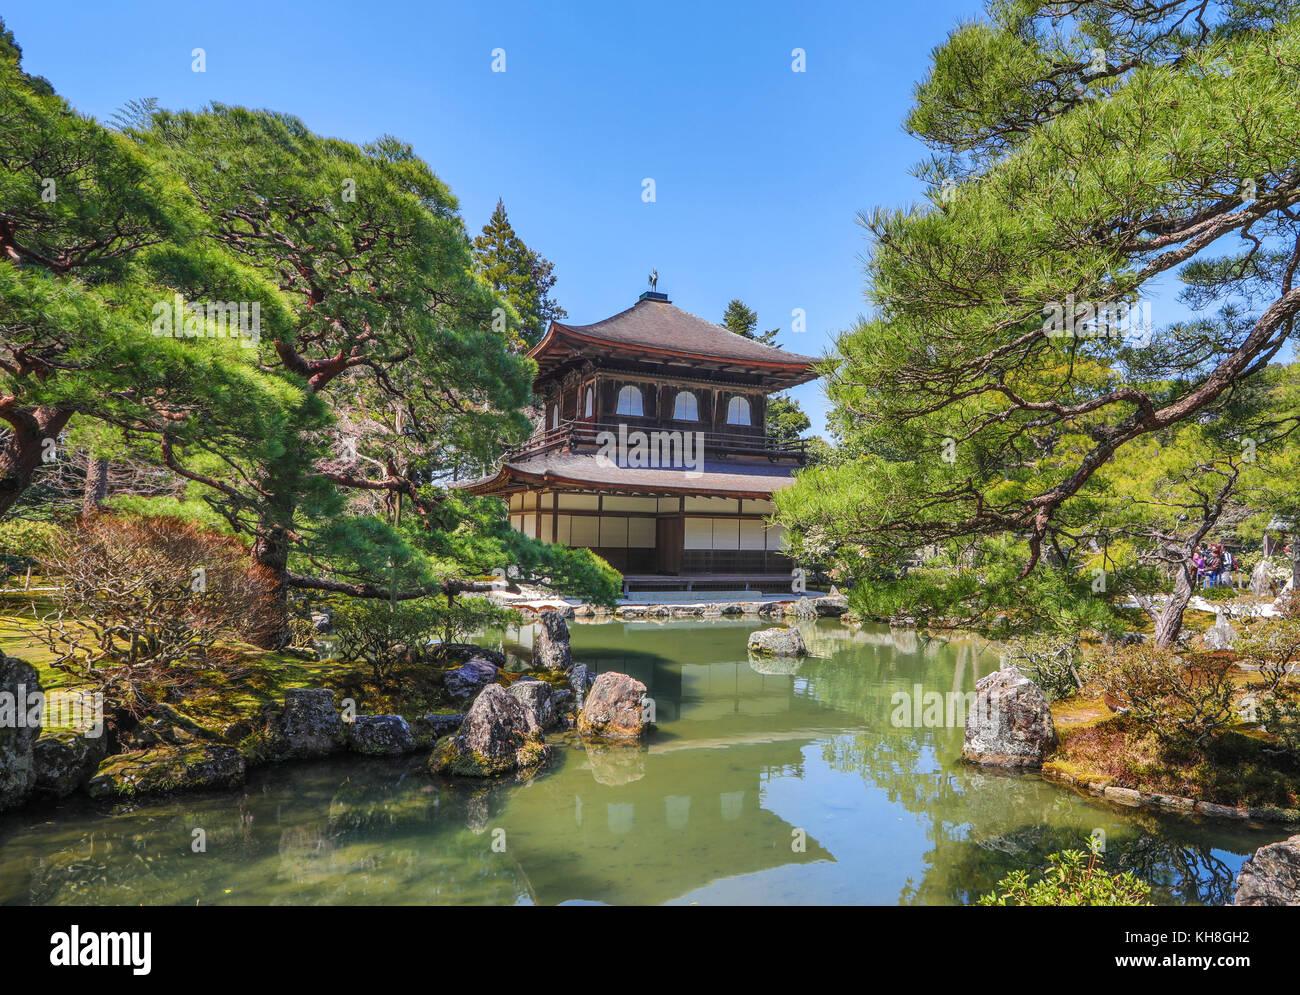 Japan, Kyoto City,Ginkaku-Ji Pavilion *** Local Caption *** architecture, Garden, GinkakuJi, japan, Kyoto City, Stock Photo